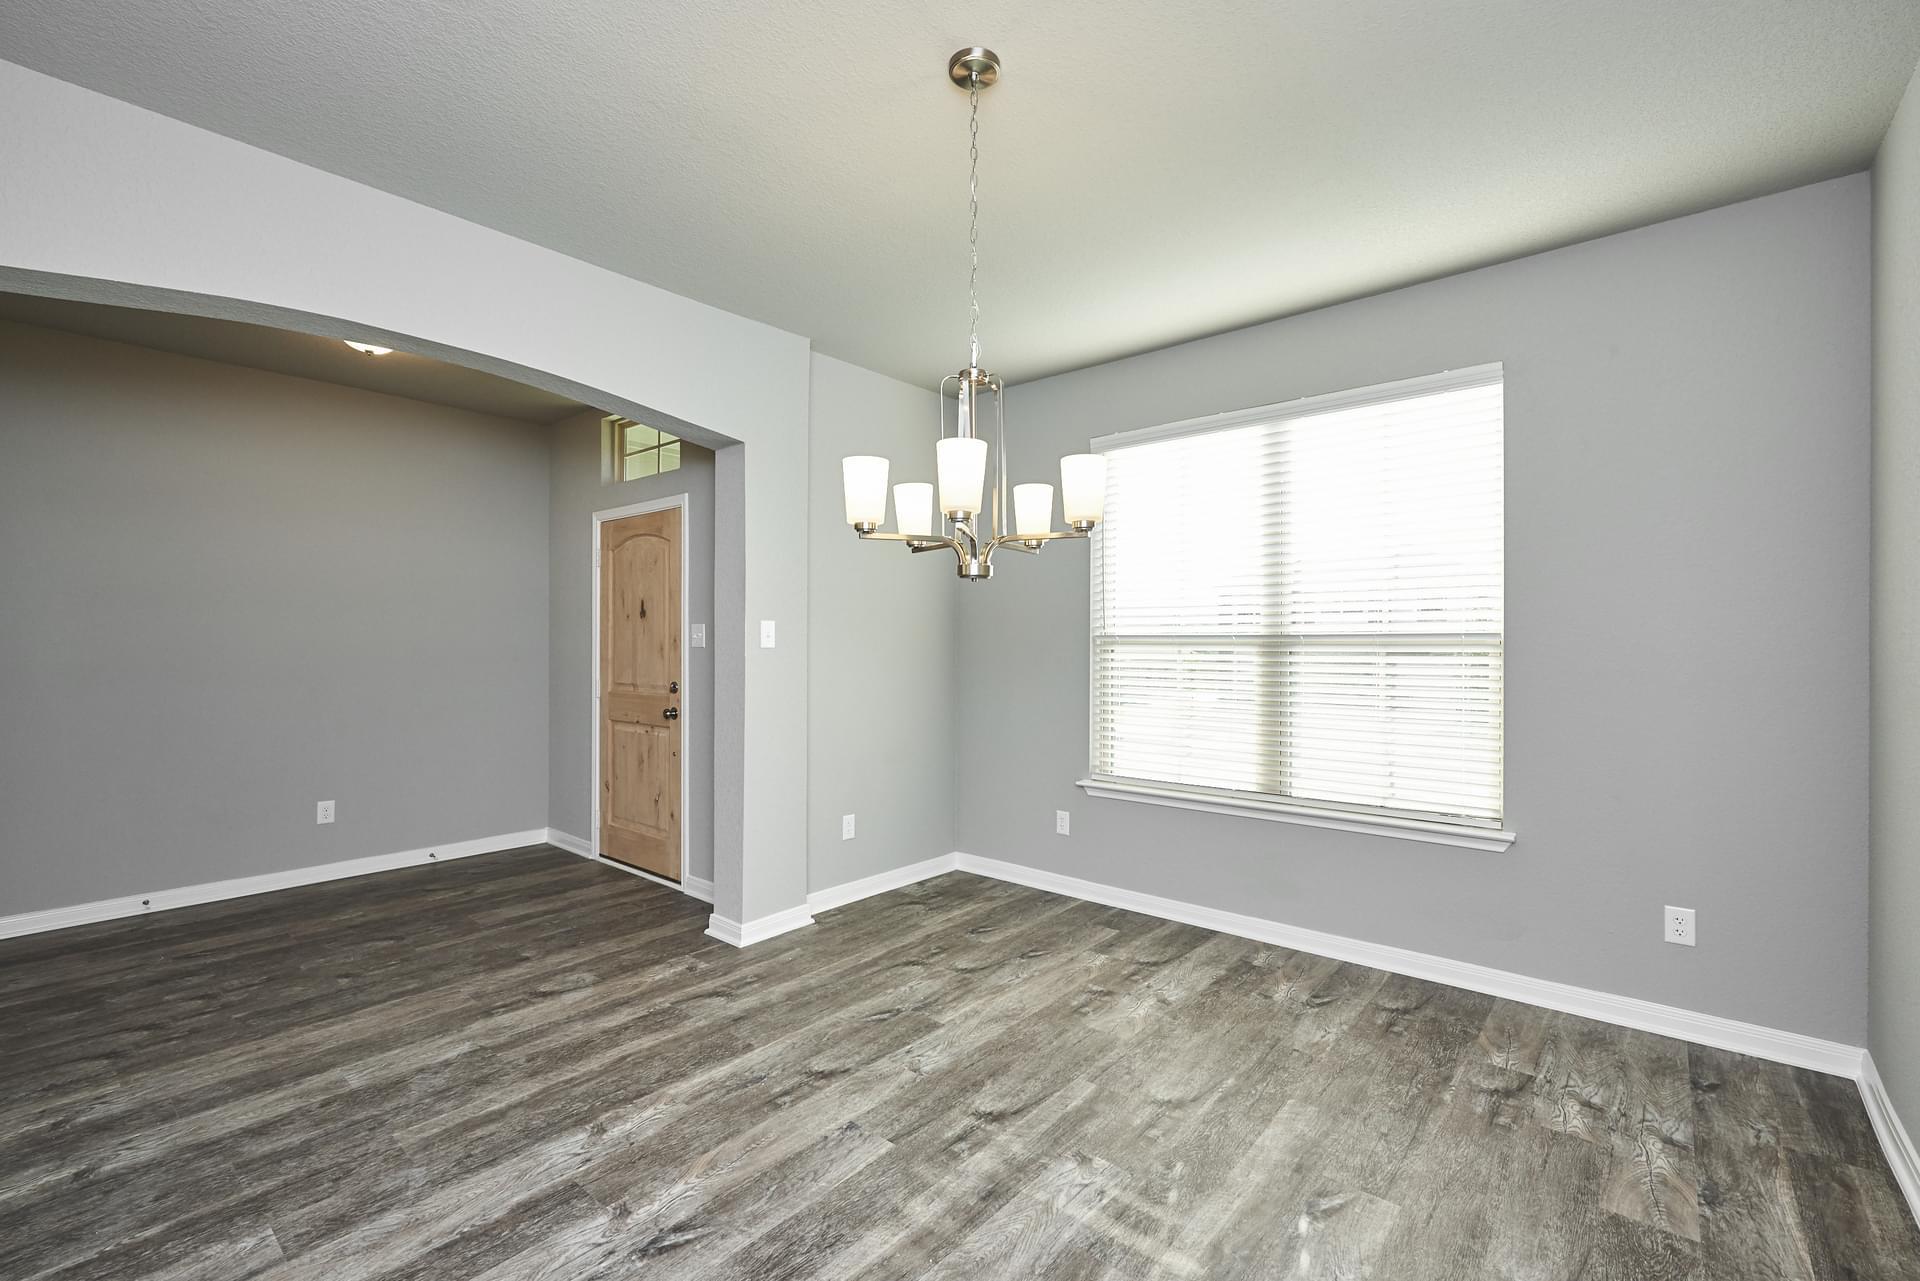 3,249sf New Home in Copperas Cove, TX